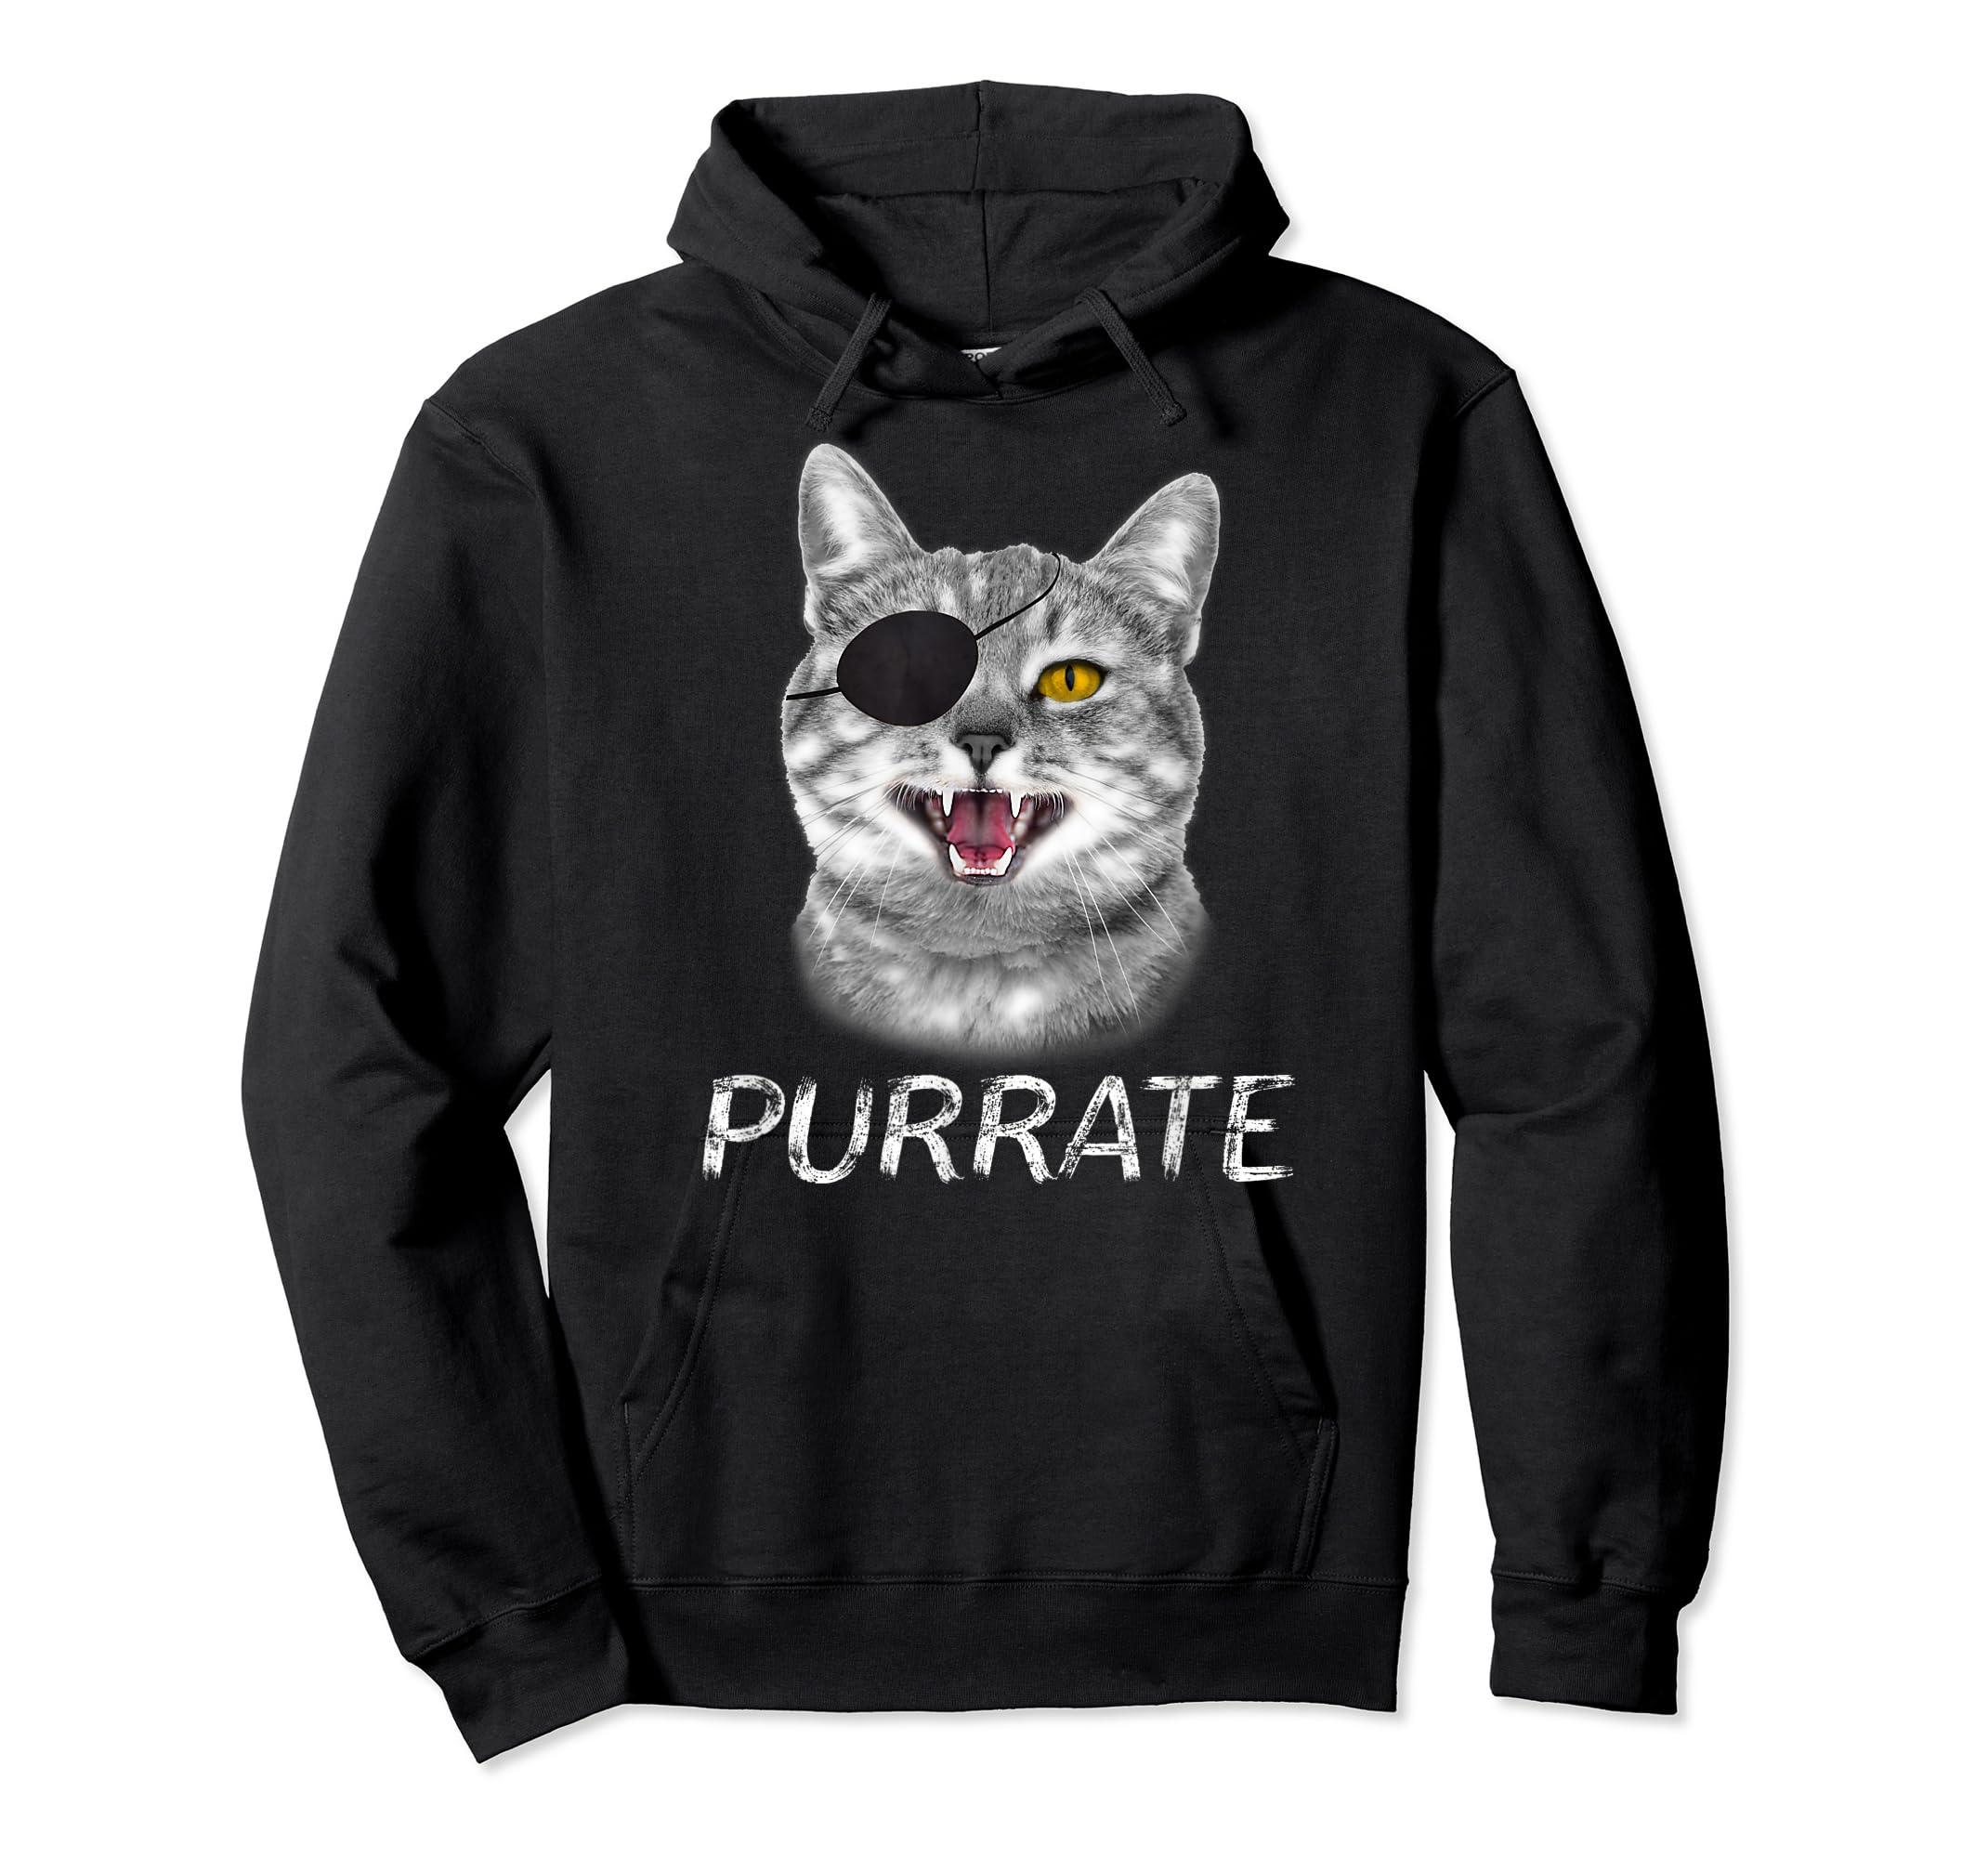 Halloween Trick Treat Cat Pirate Purrate T-Shirt-Hoodie-Black